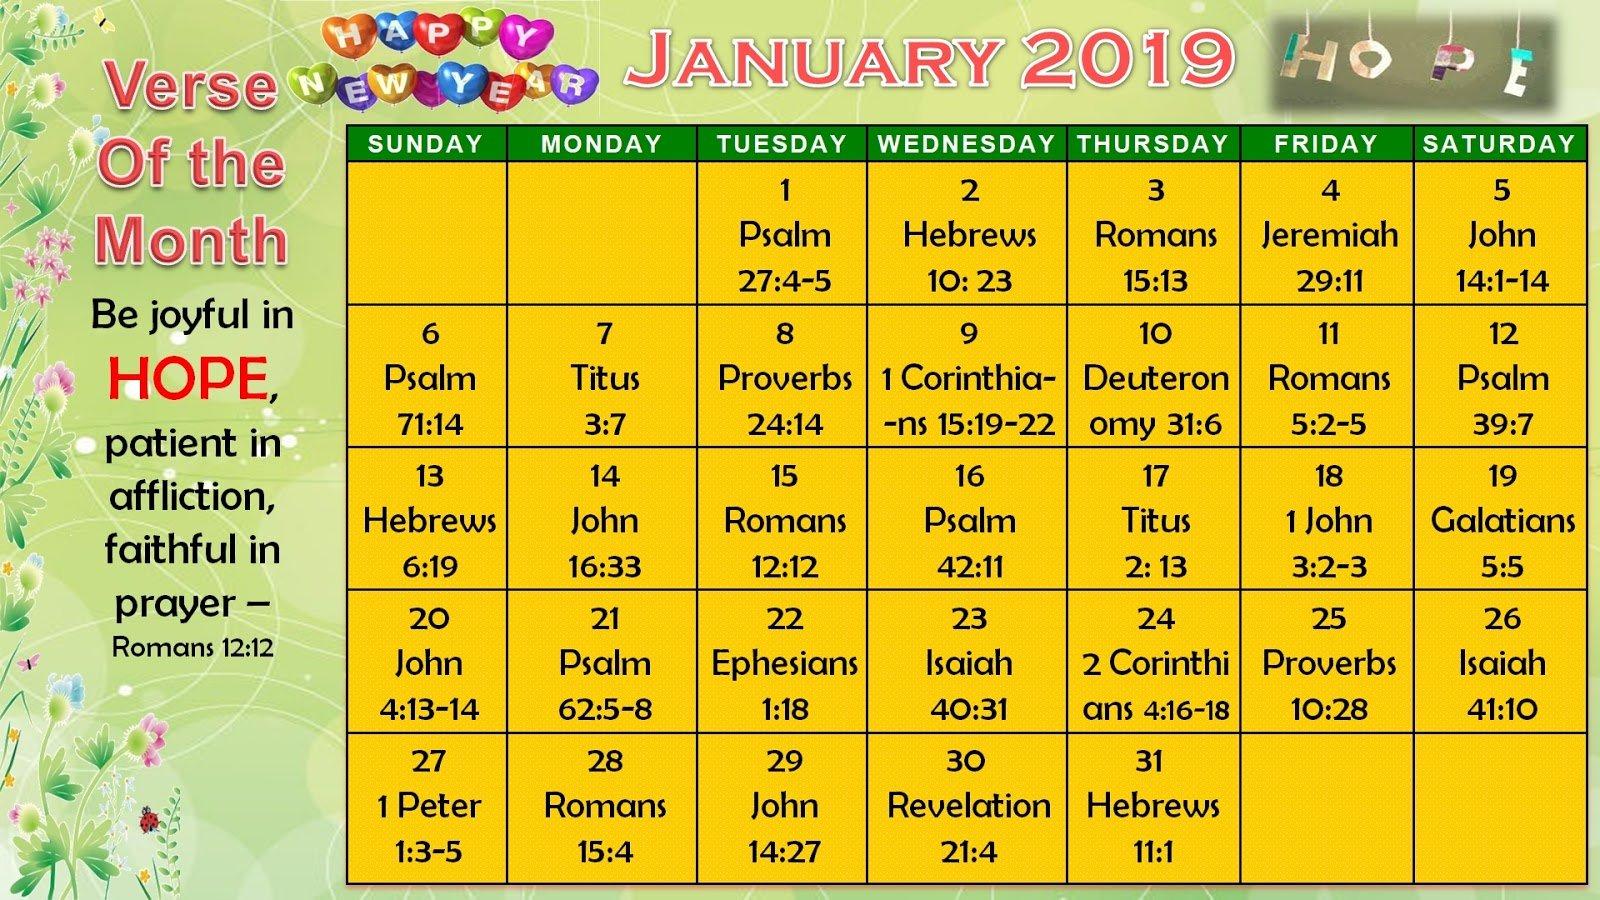 Daily Verses Calendar - January 2019 - Printable Version Daily Scripure Prayer Calendar